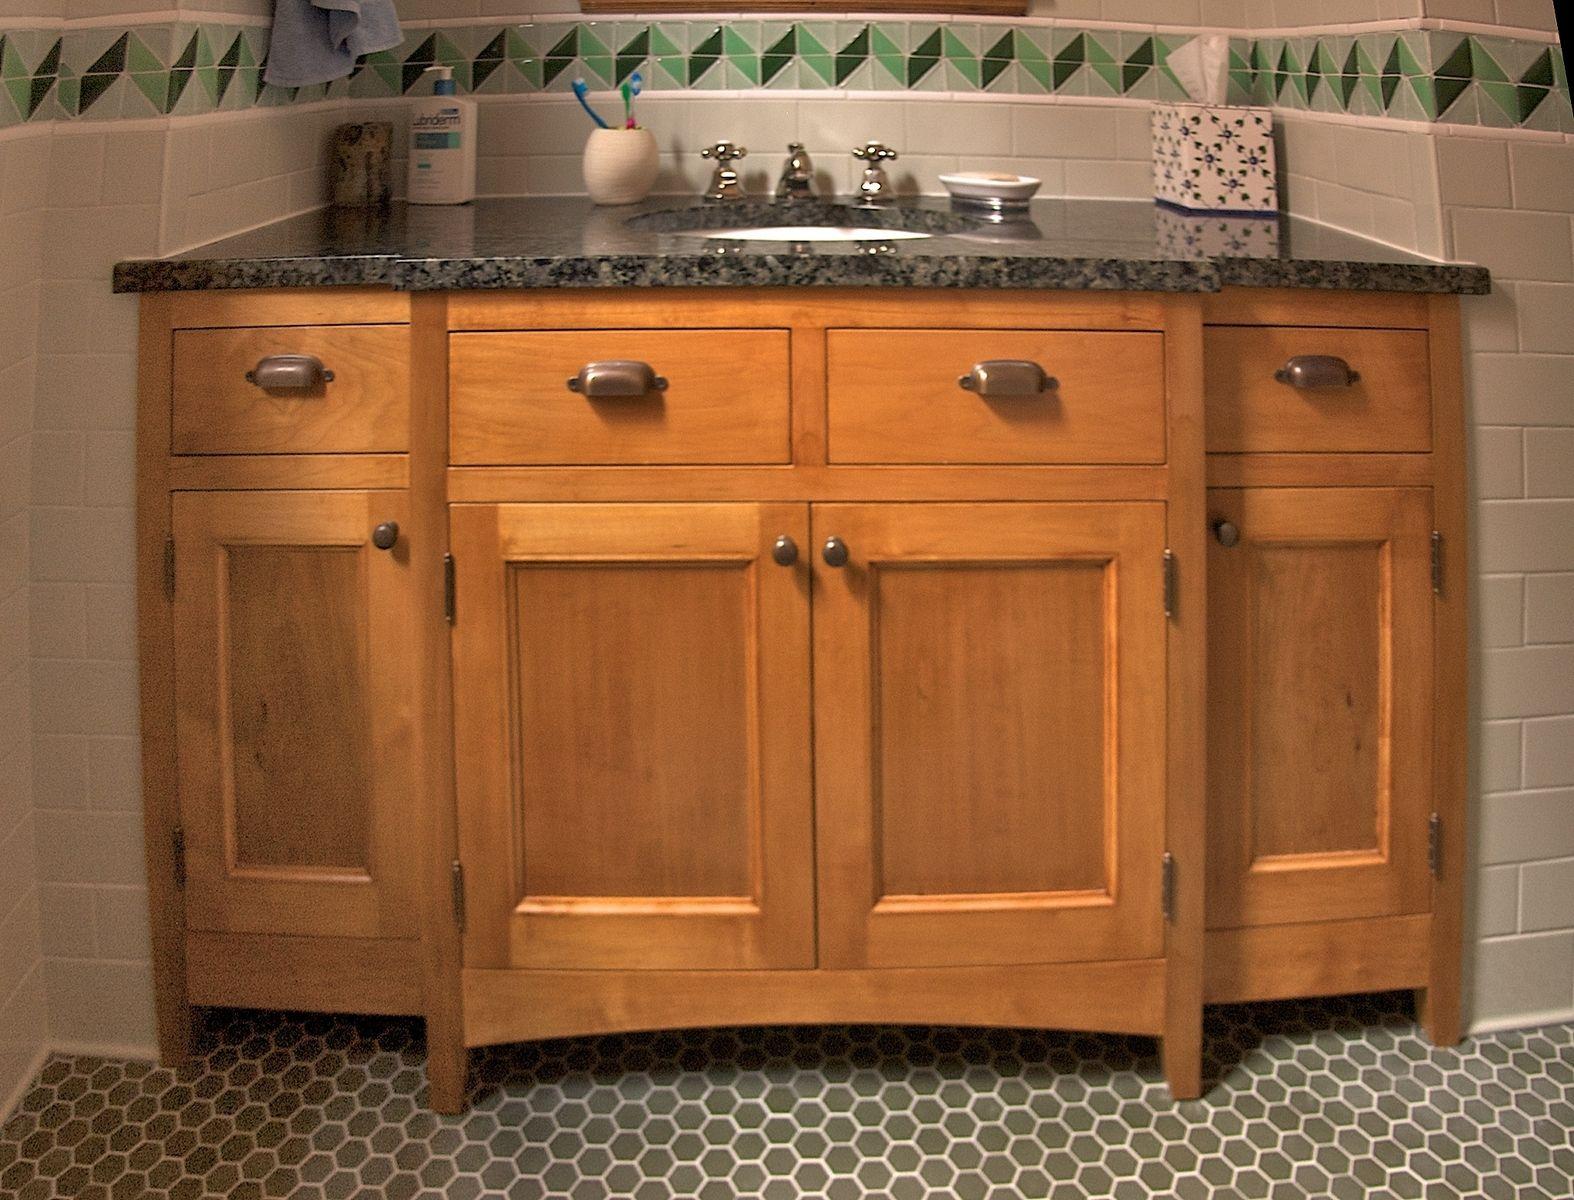 Custom Maple Bathroom Cabinetry by Mann Designs ... on Bathroom Ideas With Maple Cabinets  id=81469